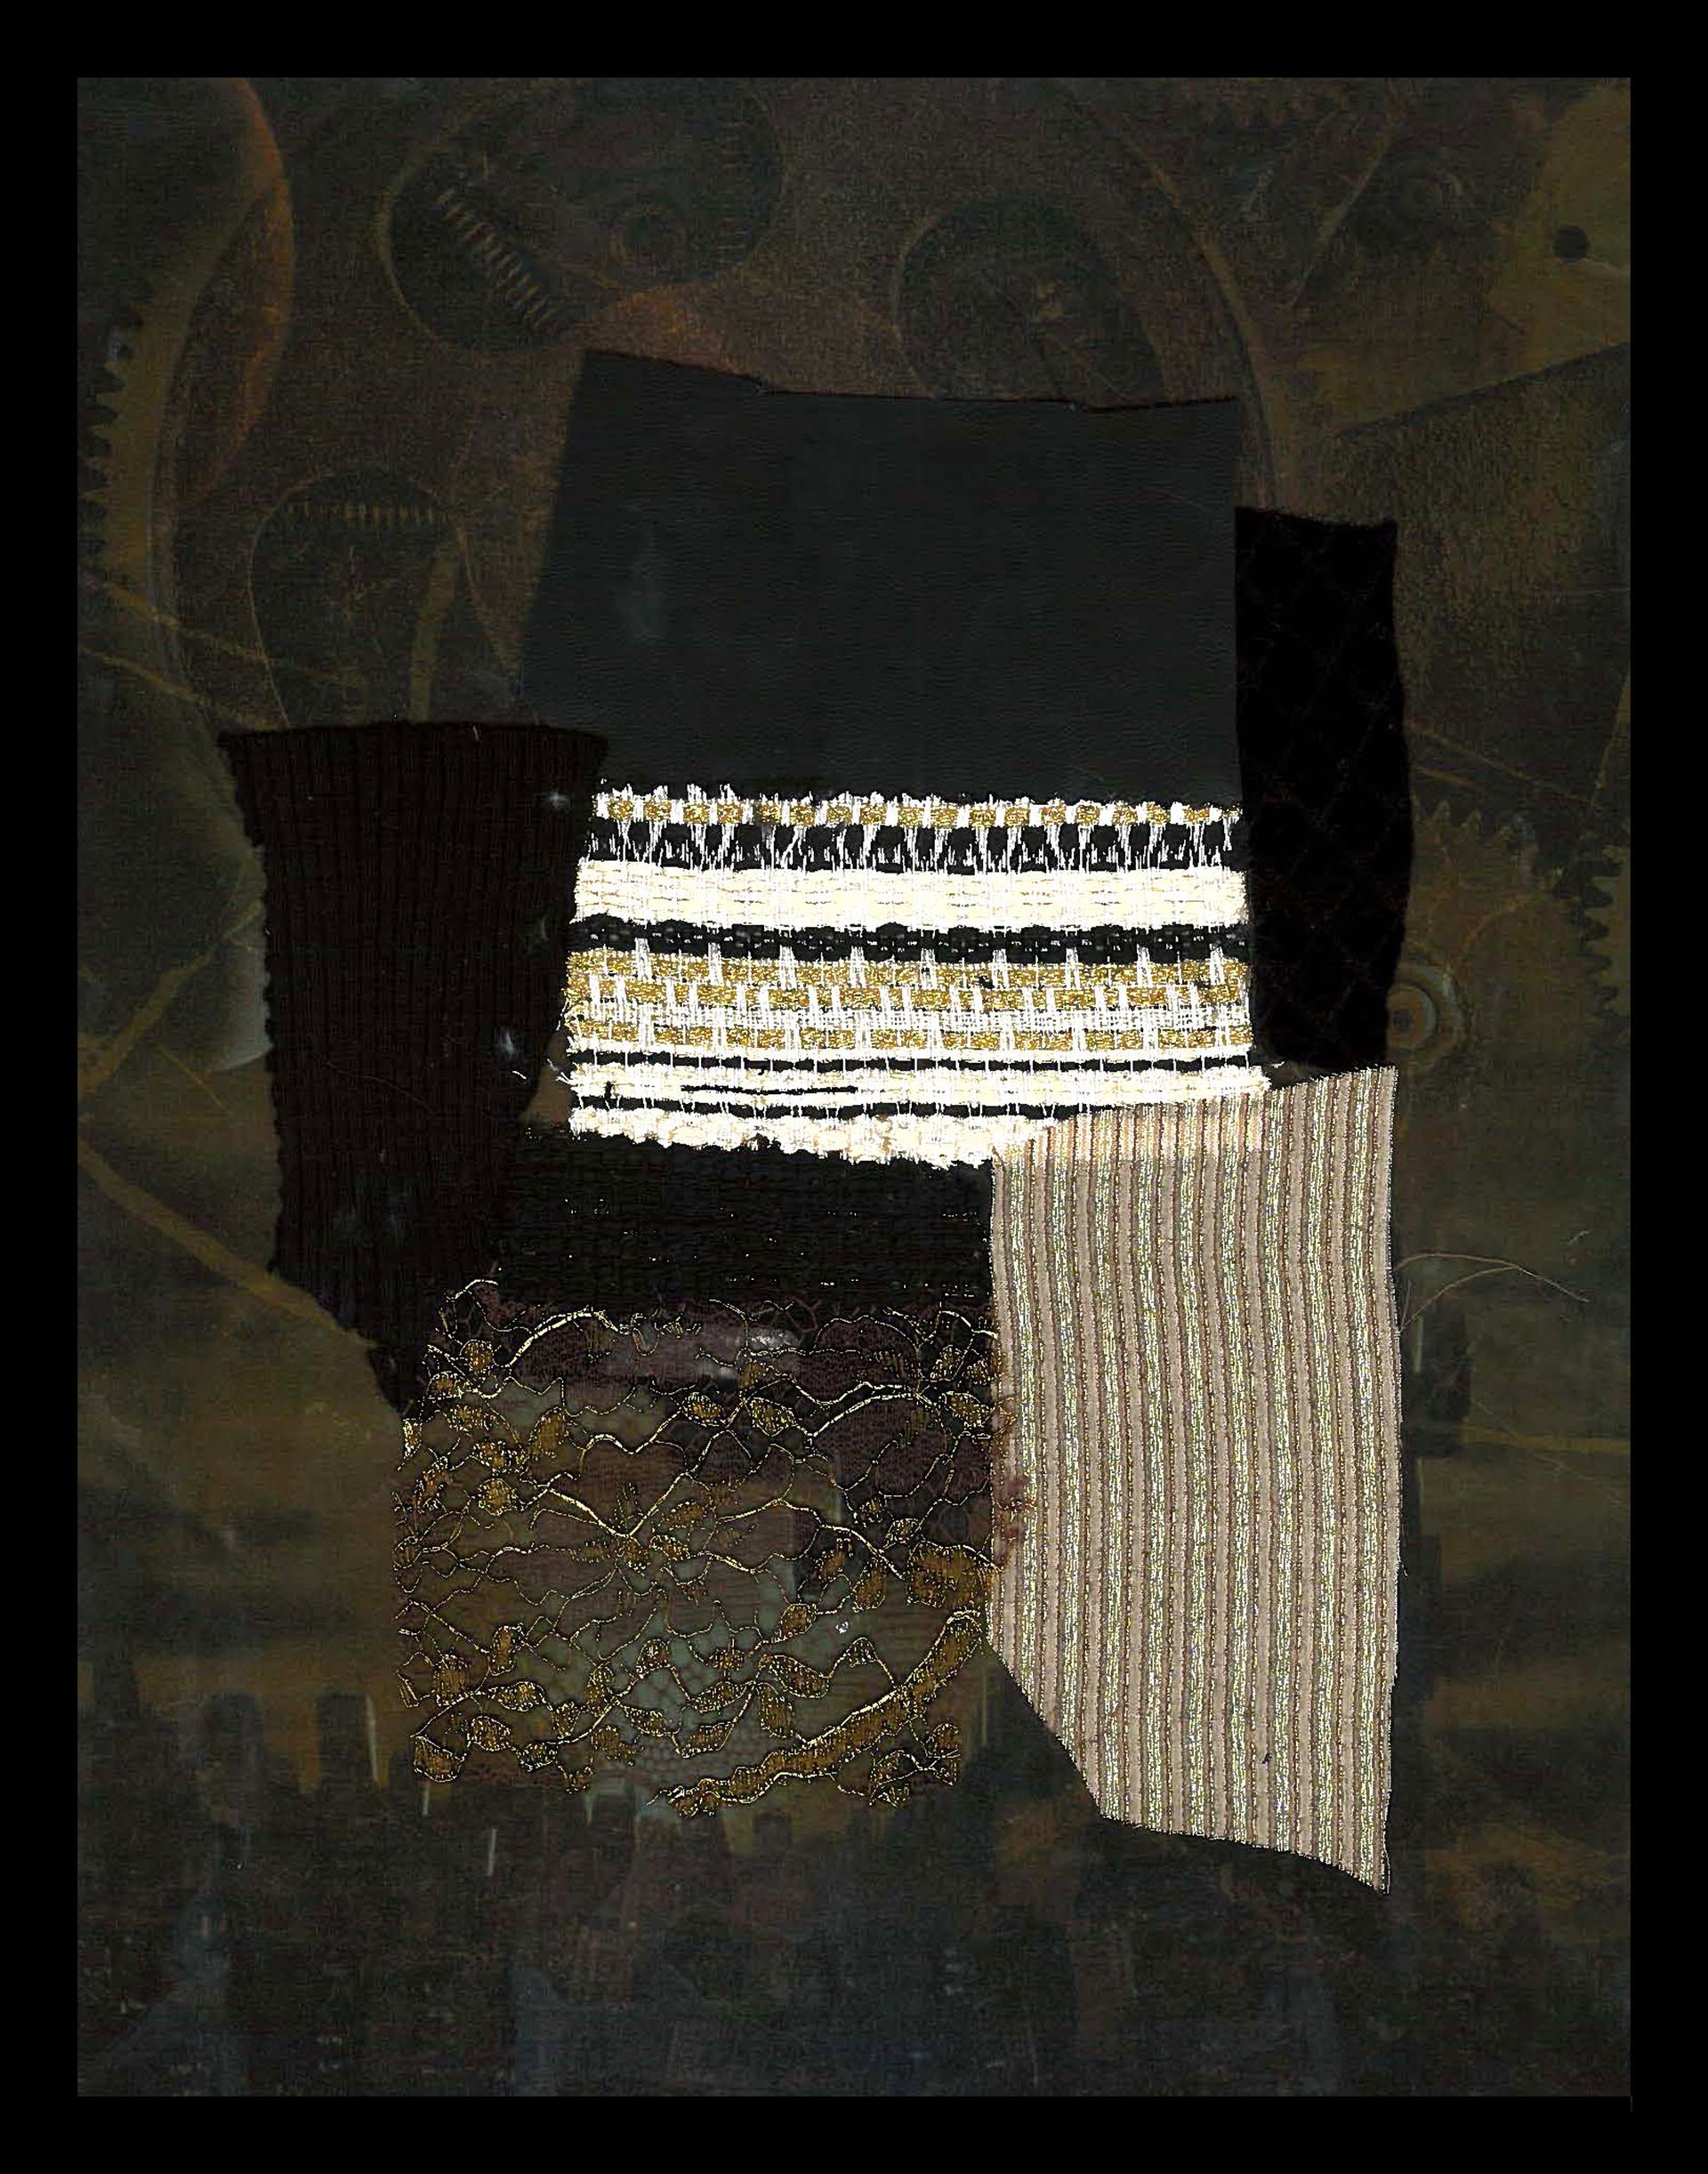 Fabric Board Faux Leather; Rib Knit; Cotton Boucle; Lace; Cotton